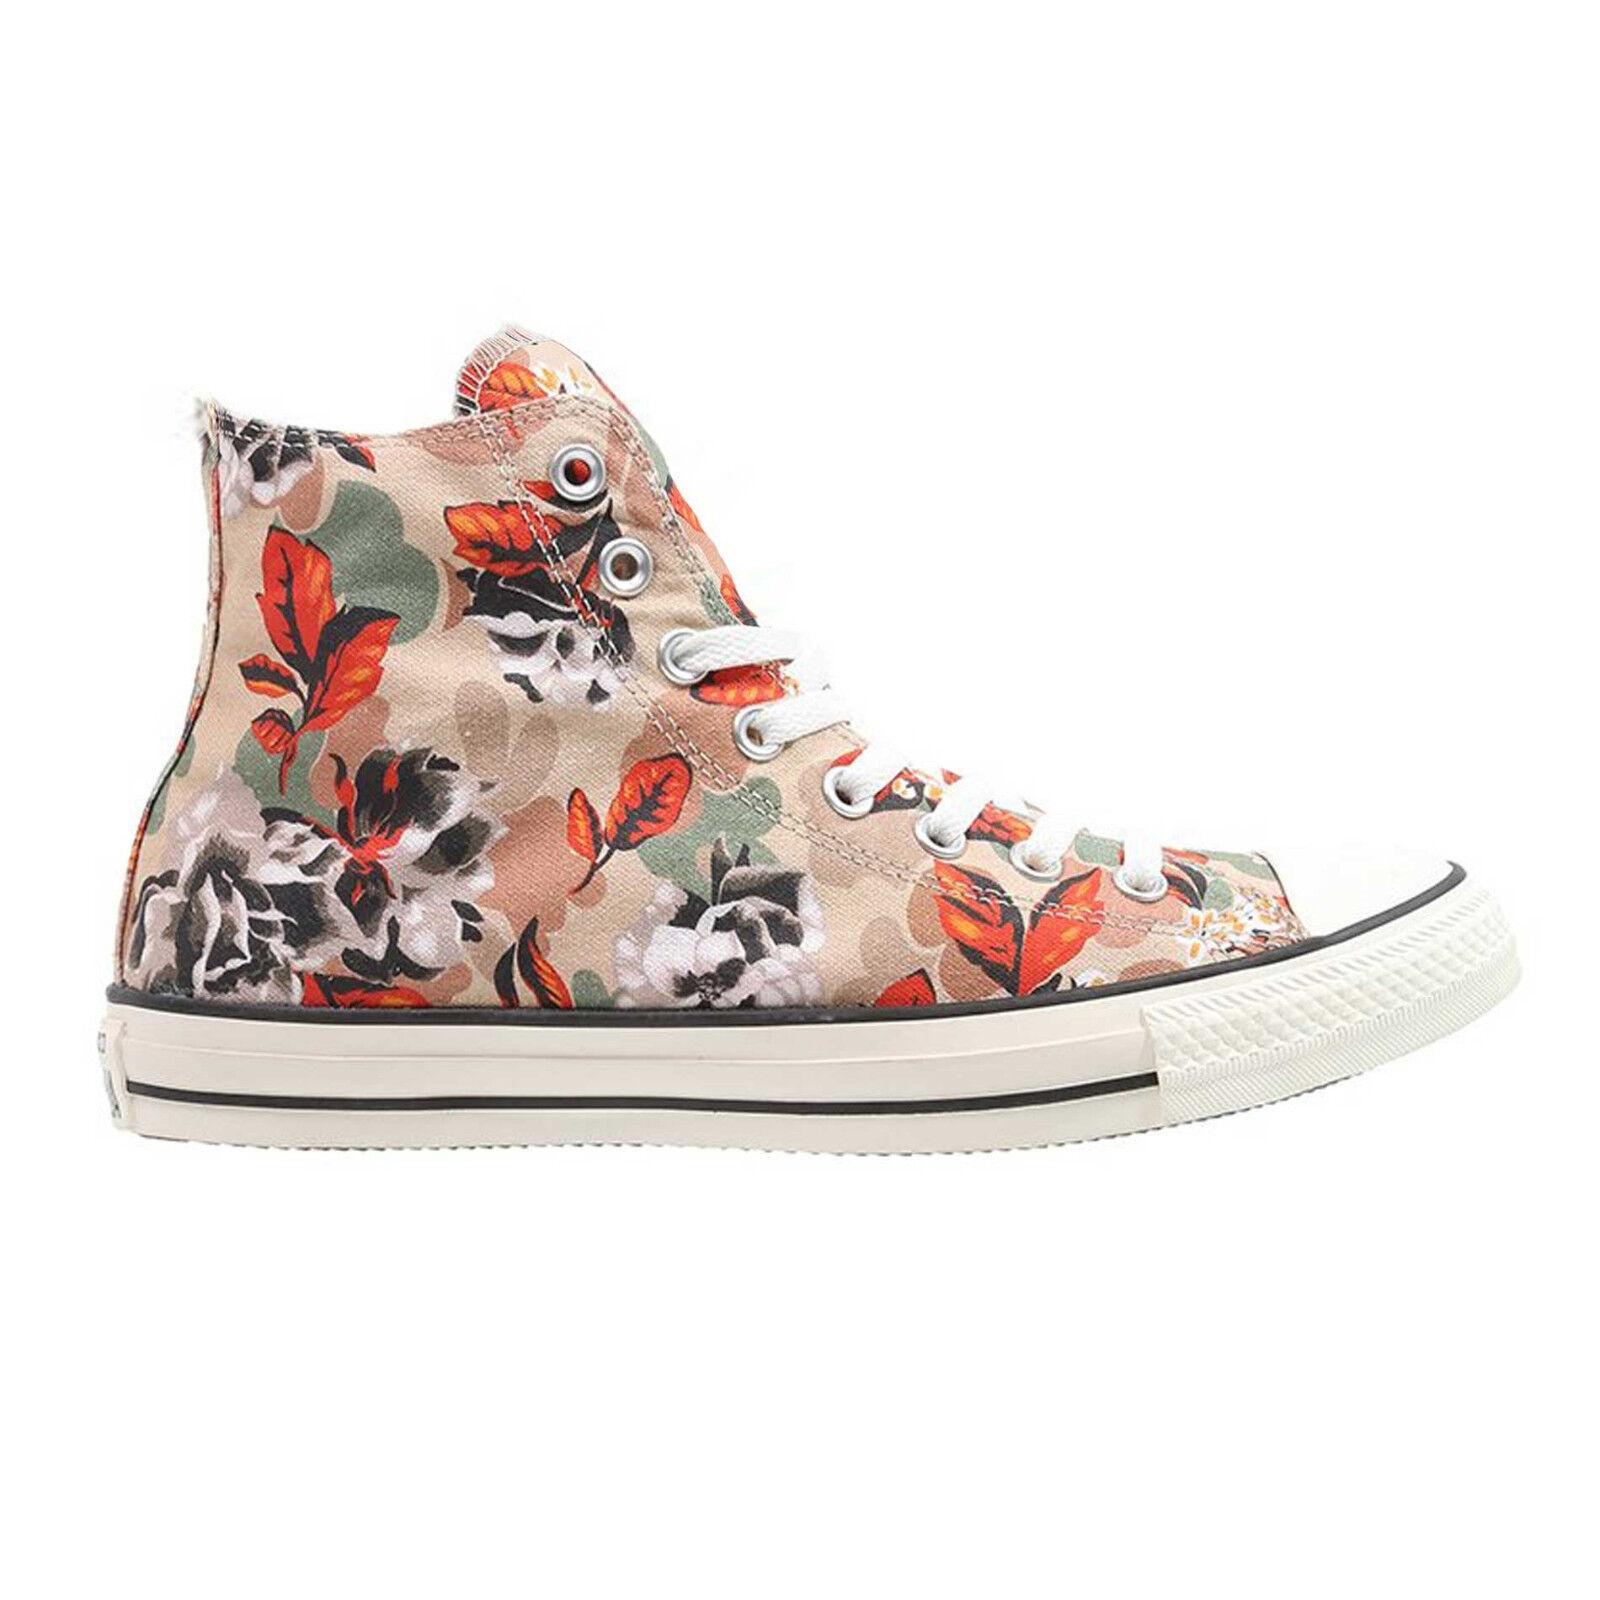 Converse Converse Converse Hi Chuck Taylor All Star Schuhe Chucks mehrere Farben 073adf